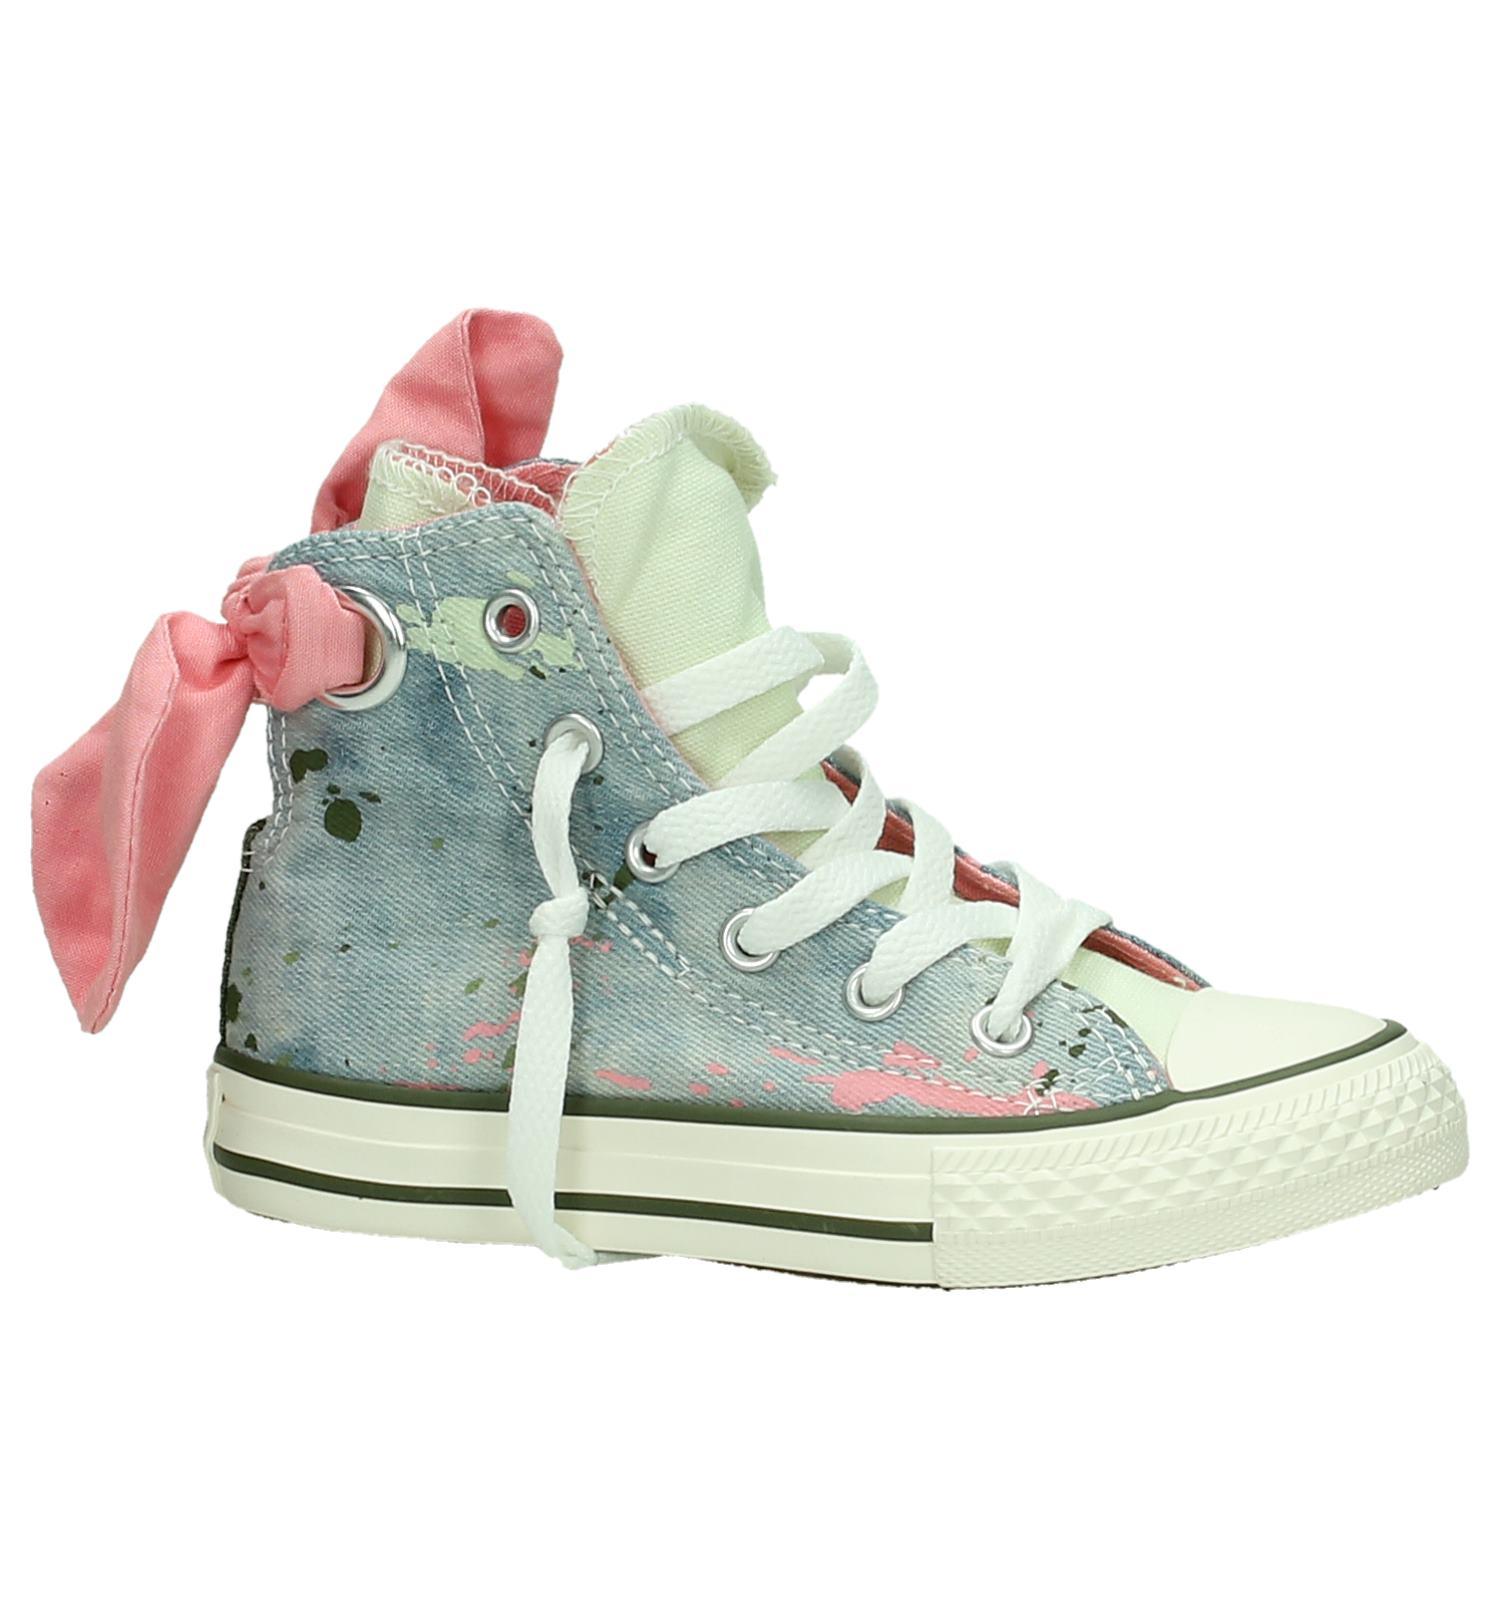 6dab70b54ed Converse Chuck Taylor AS Bow Back Hi Blauwe Sneakers | TORFS.BE | Gratis  verzend en retour